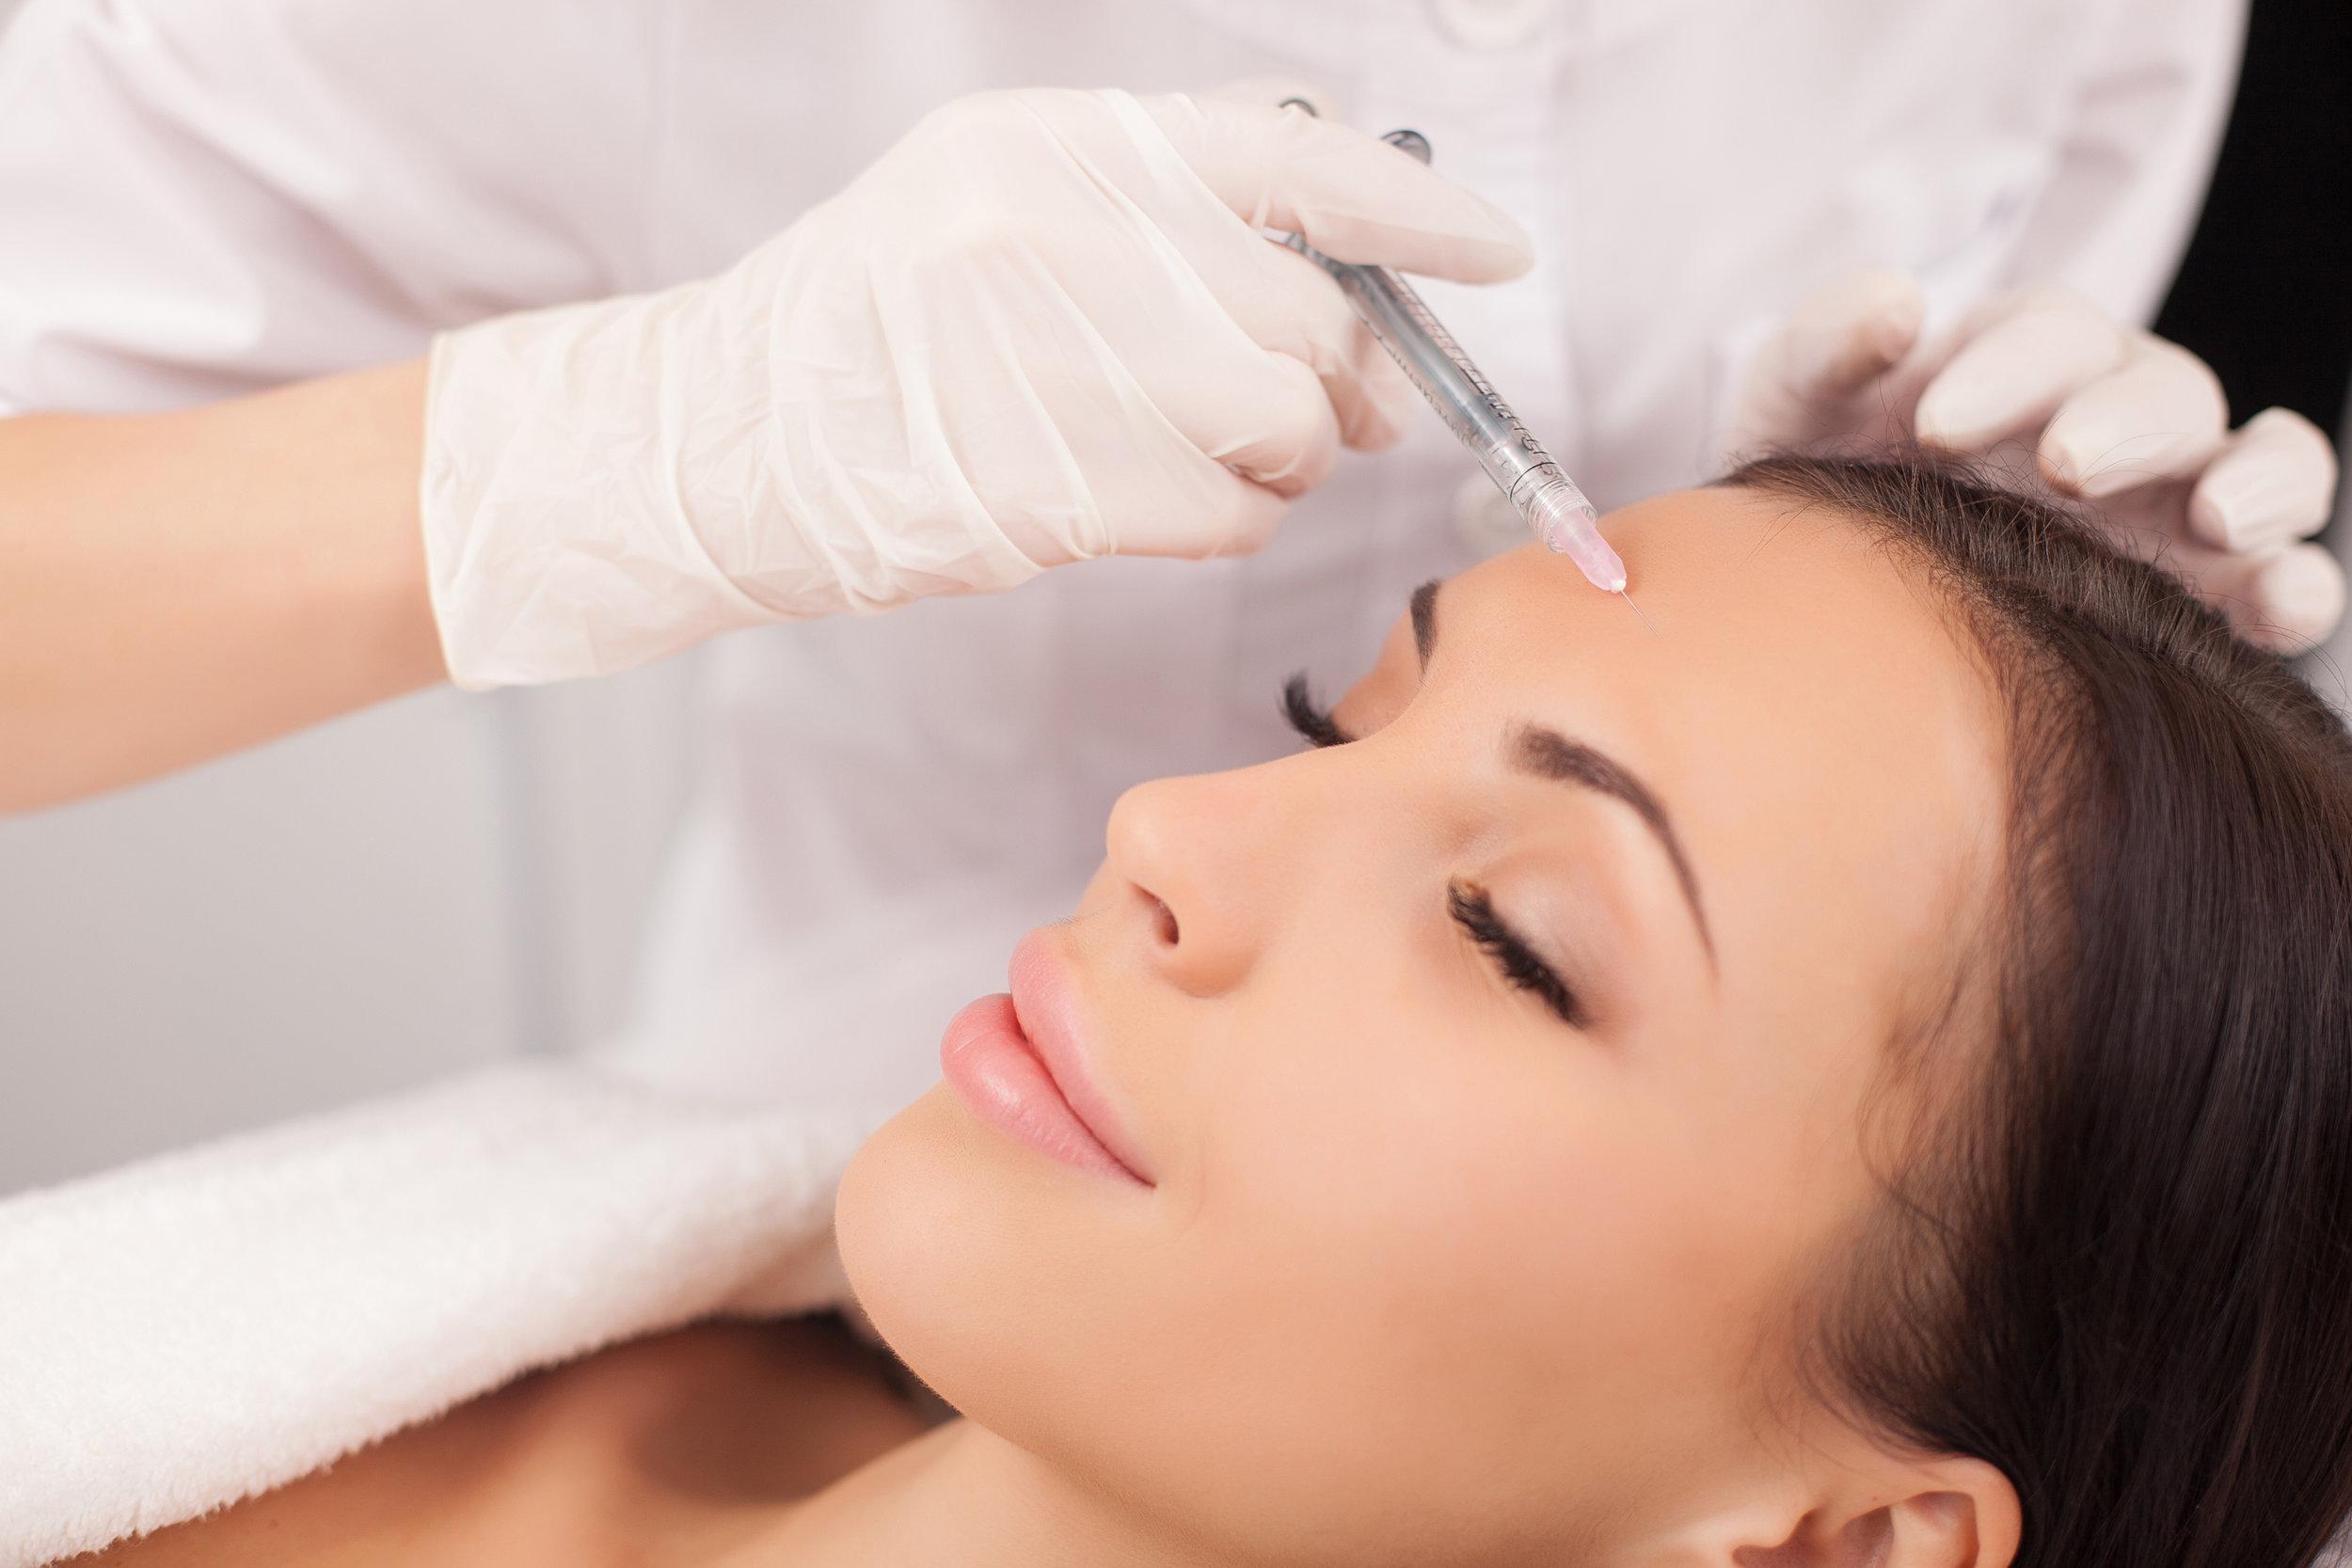 Injectables - Botox, Dysport, Juvederm, & Restylane